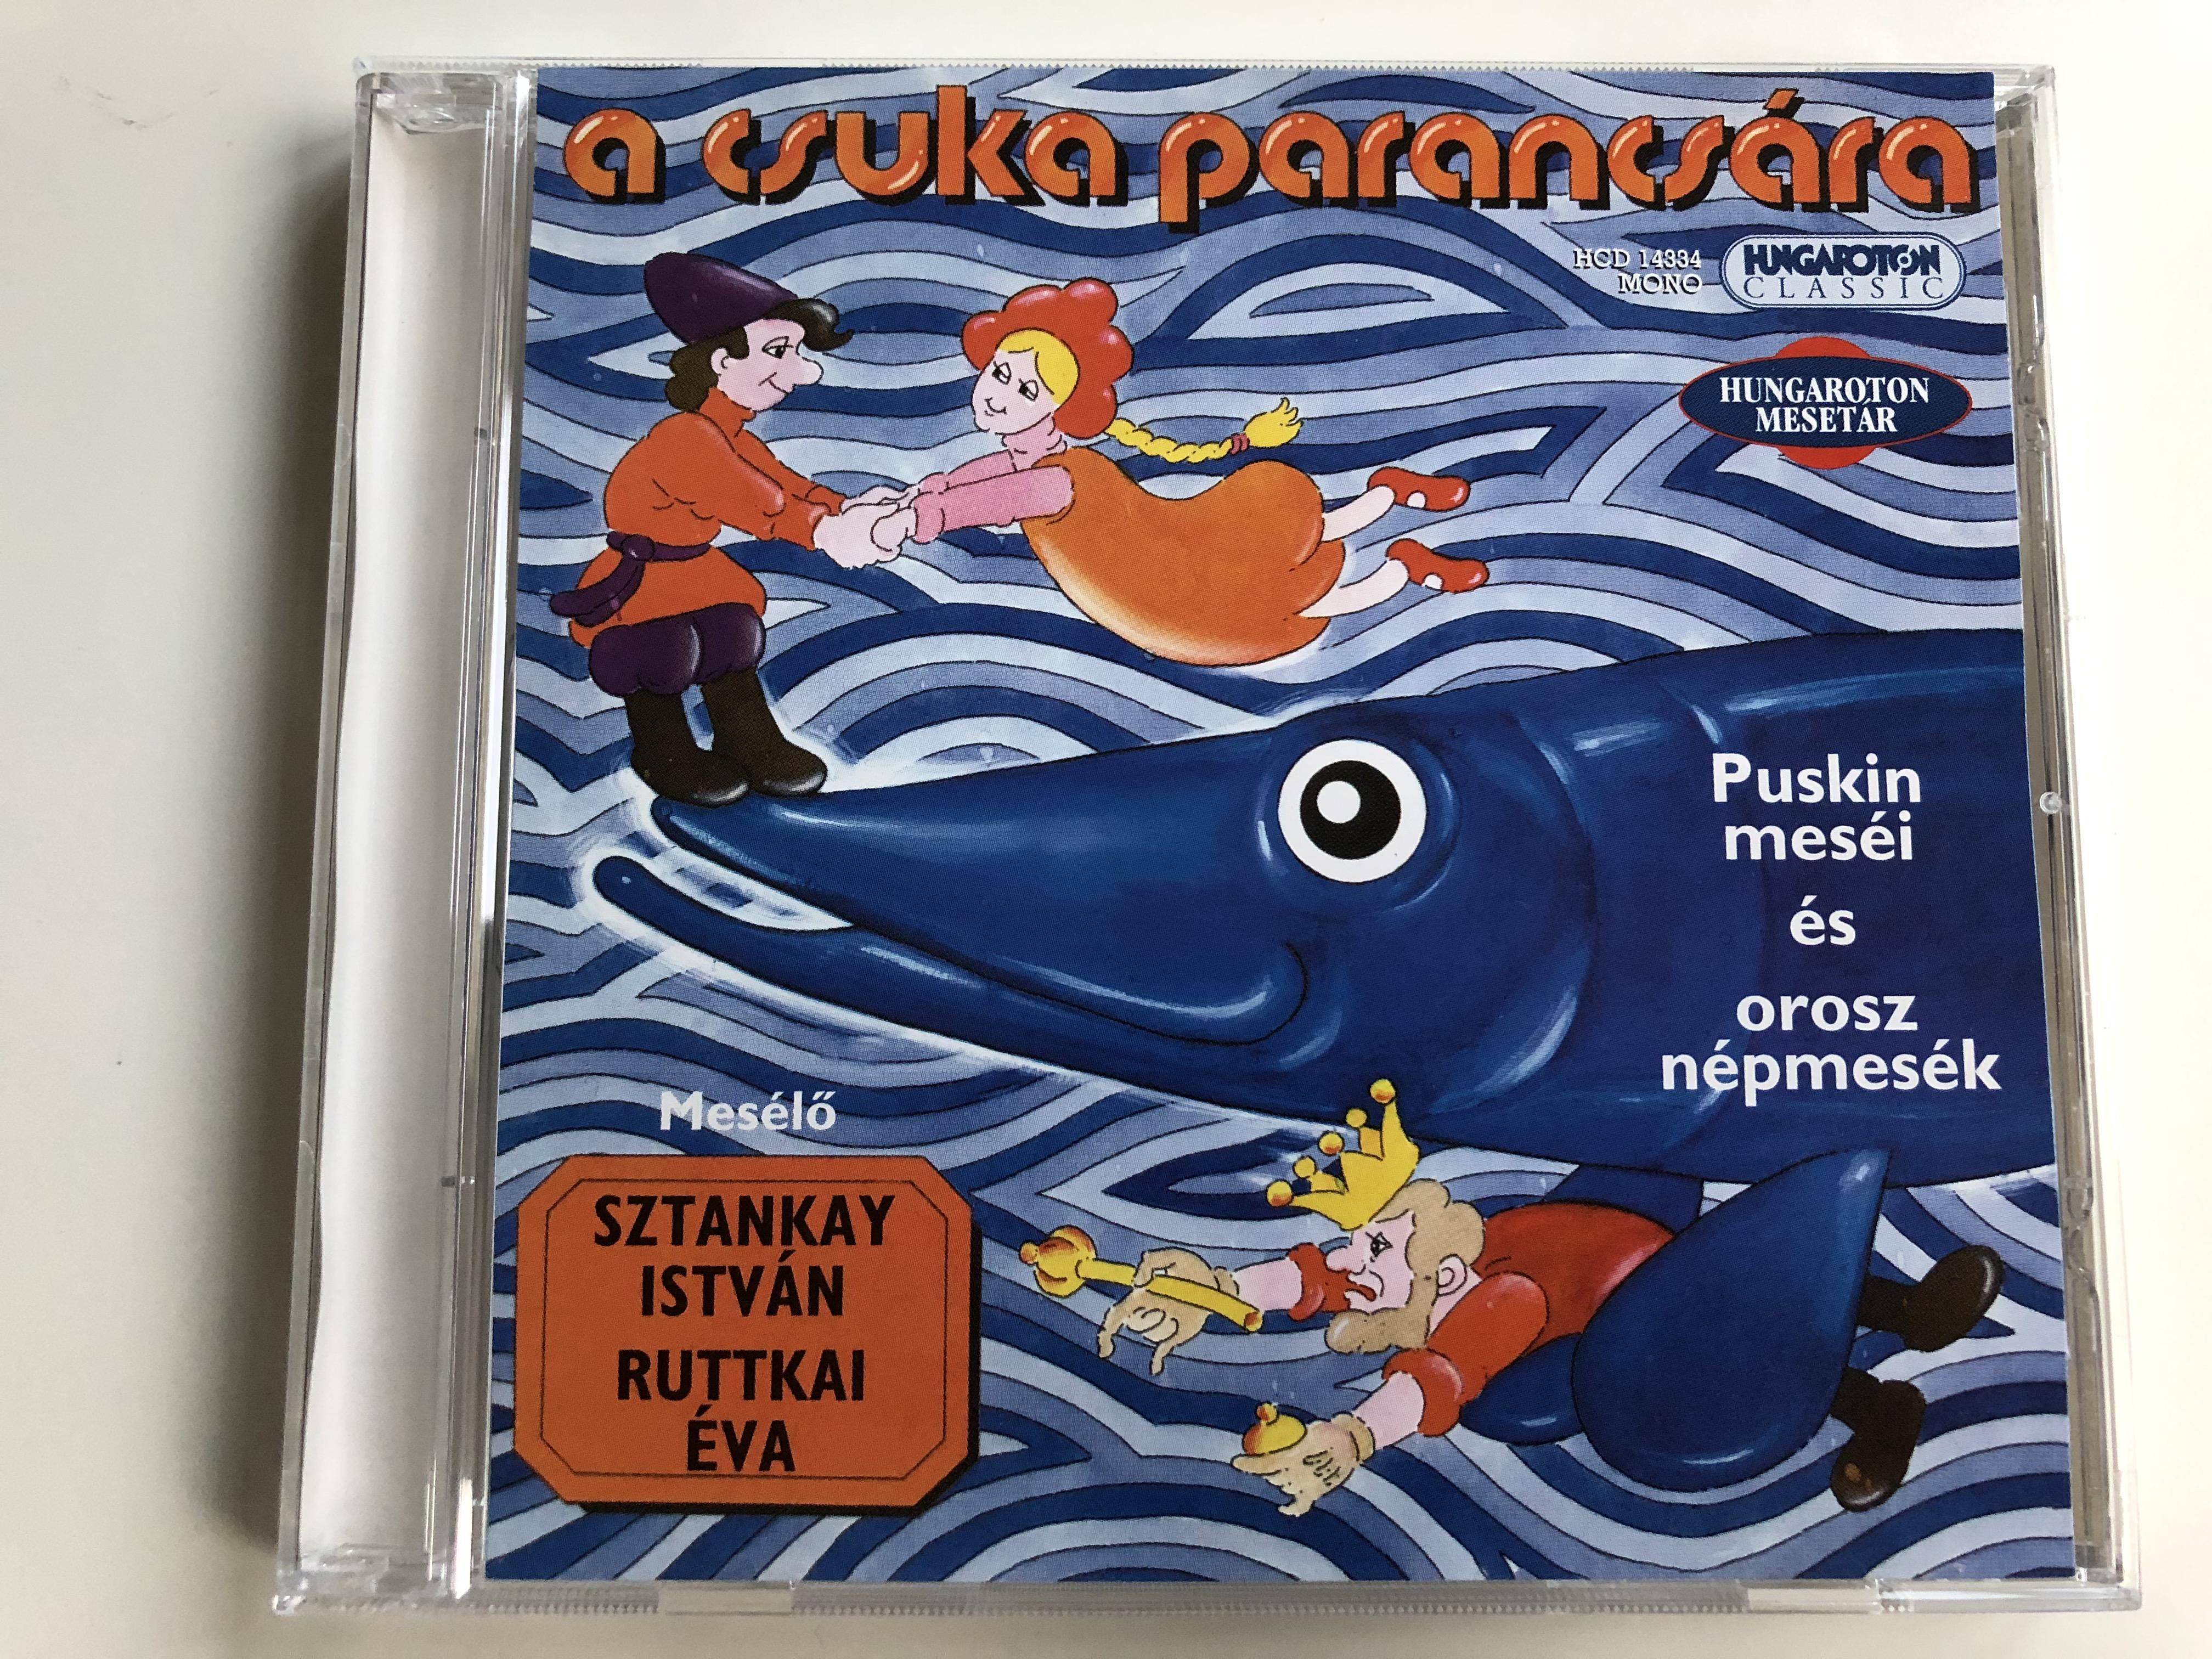 a-csuka-parancs-ra-puskin-mesei-es-orosz-n-pmes-k-sztankay-istv-n-ruttkai-eva-hungaroton-classic-audio-cd-2006-mono-hcd-14334-1-.jpg